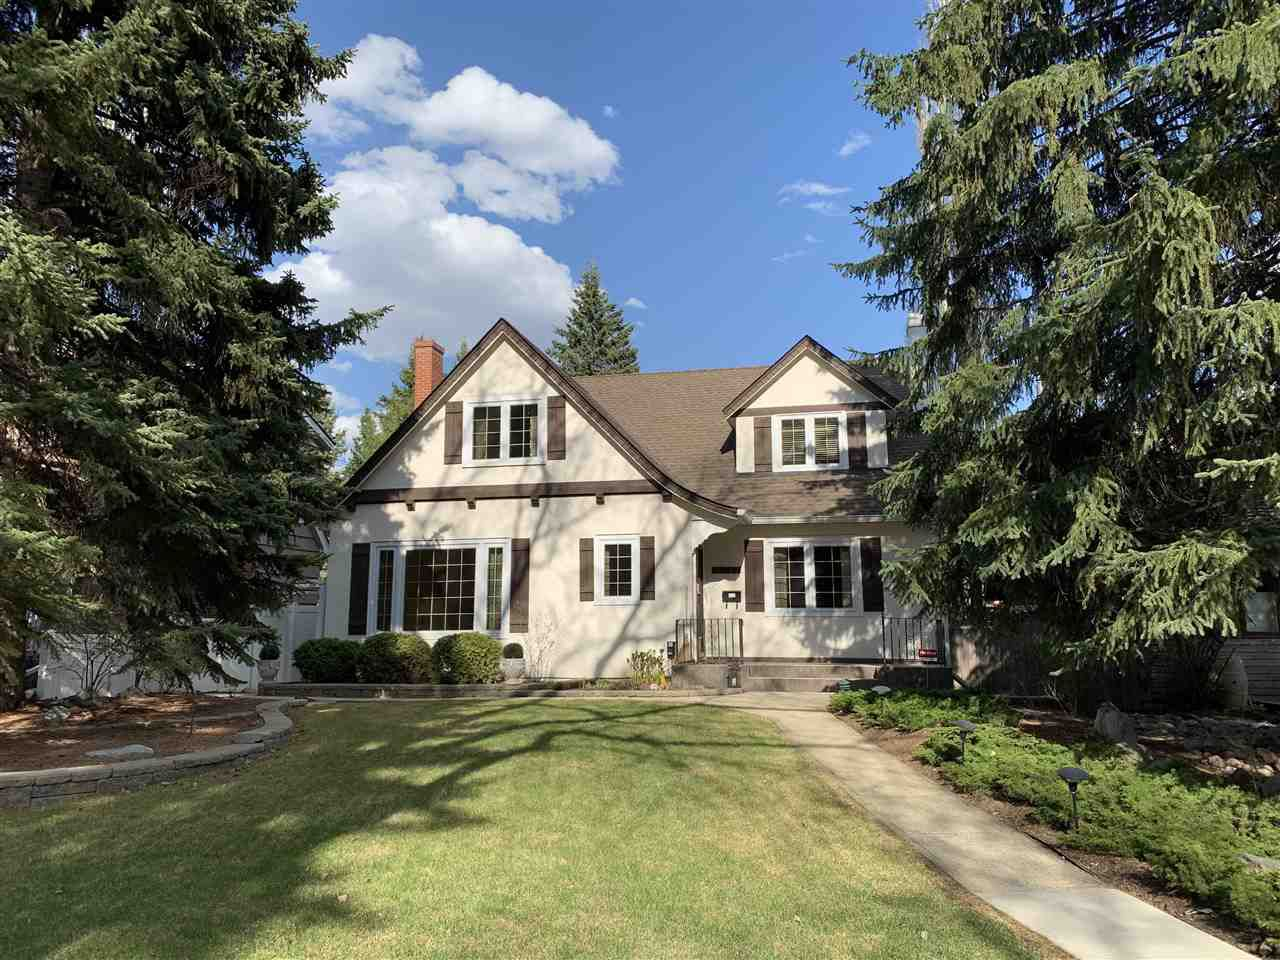 Main Photo: 10327 GLENORA Crescent in Edmonton: Zone 11 House for sale : MLS®# E4157122